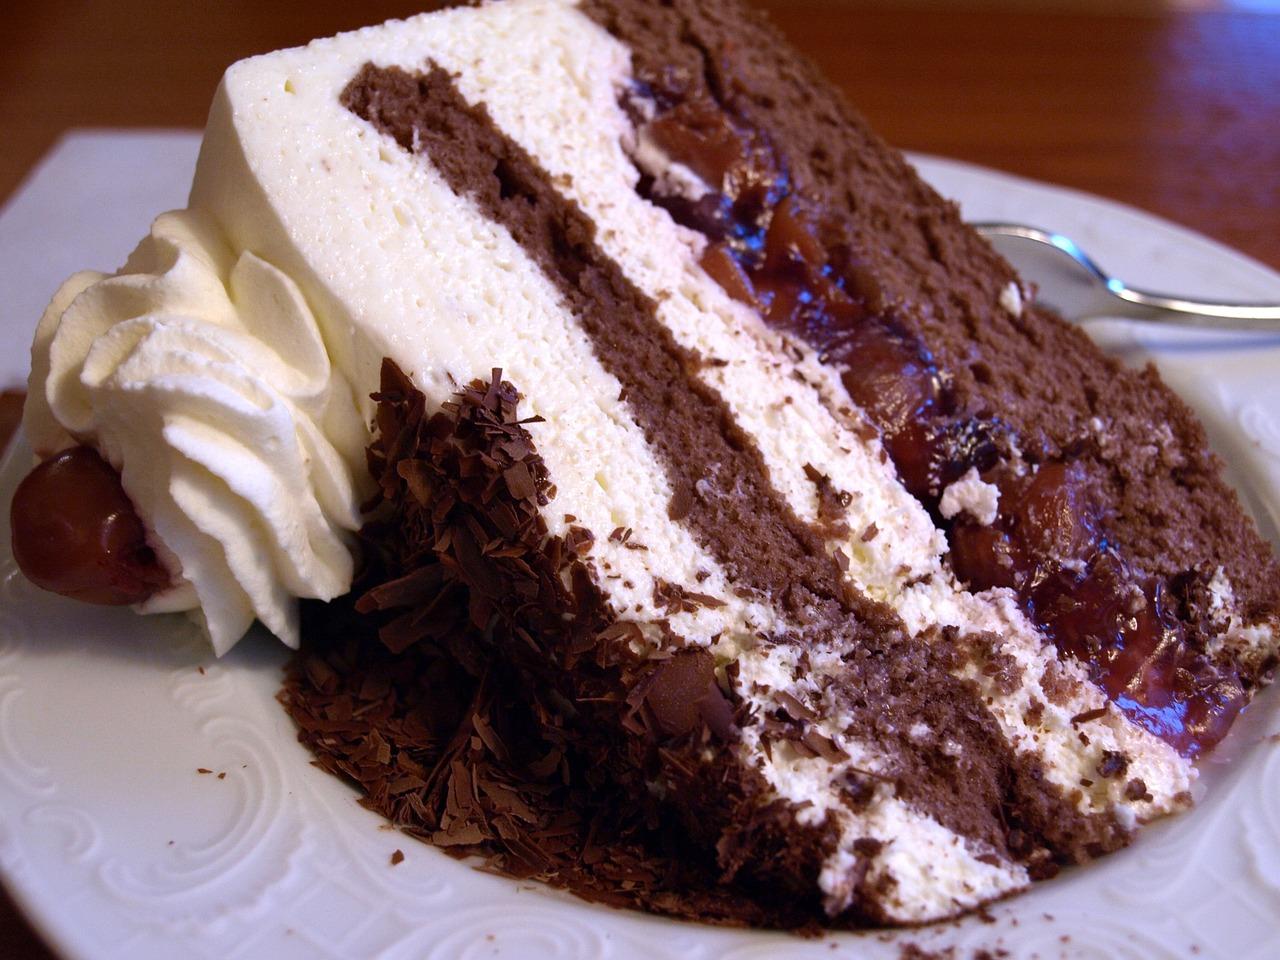 black-forest-cake-1382649_1280